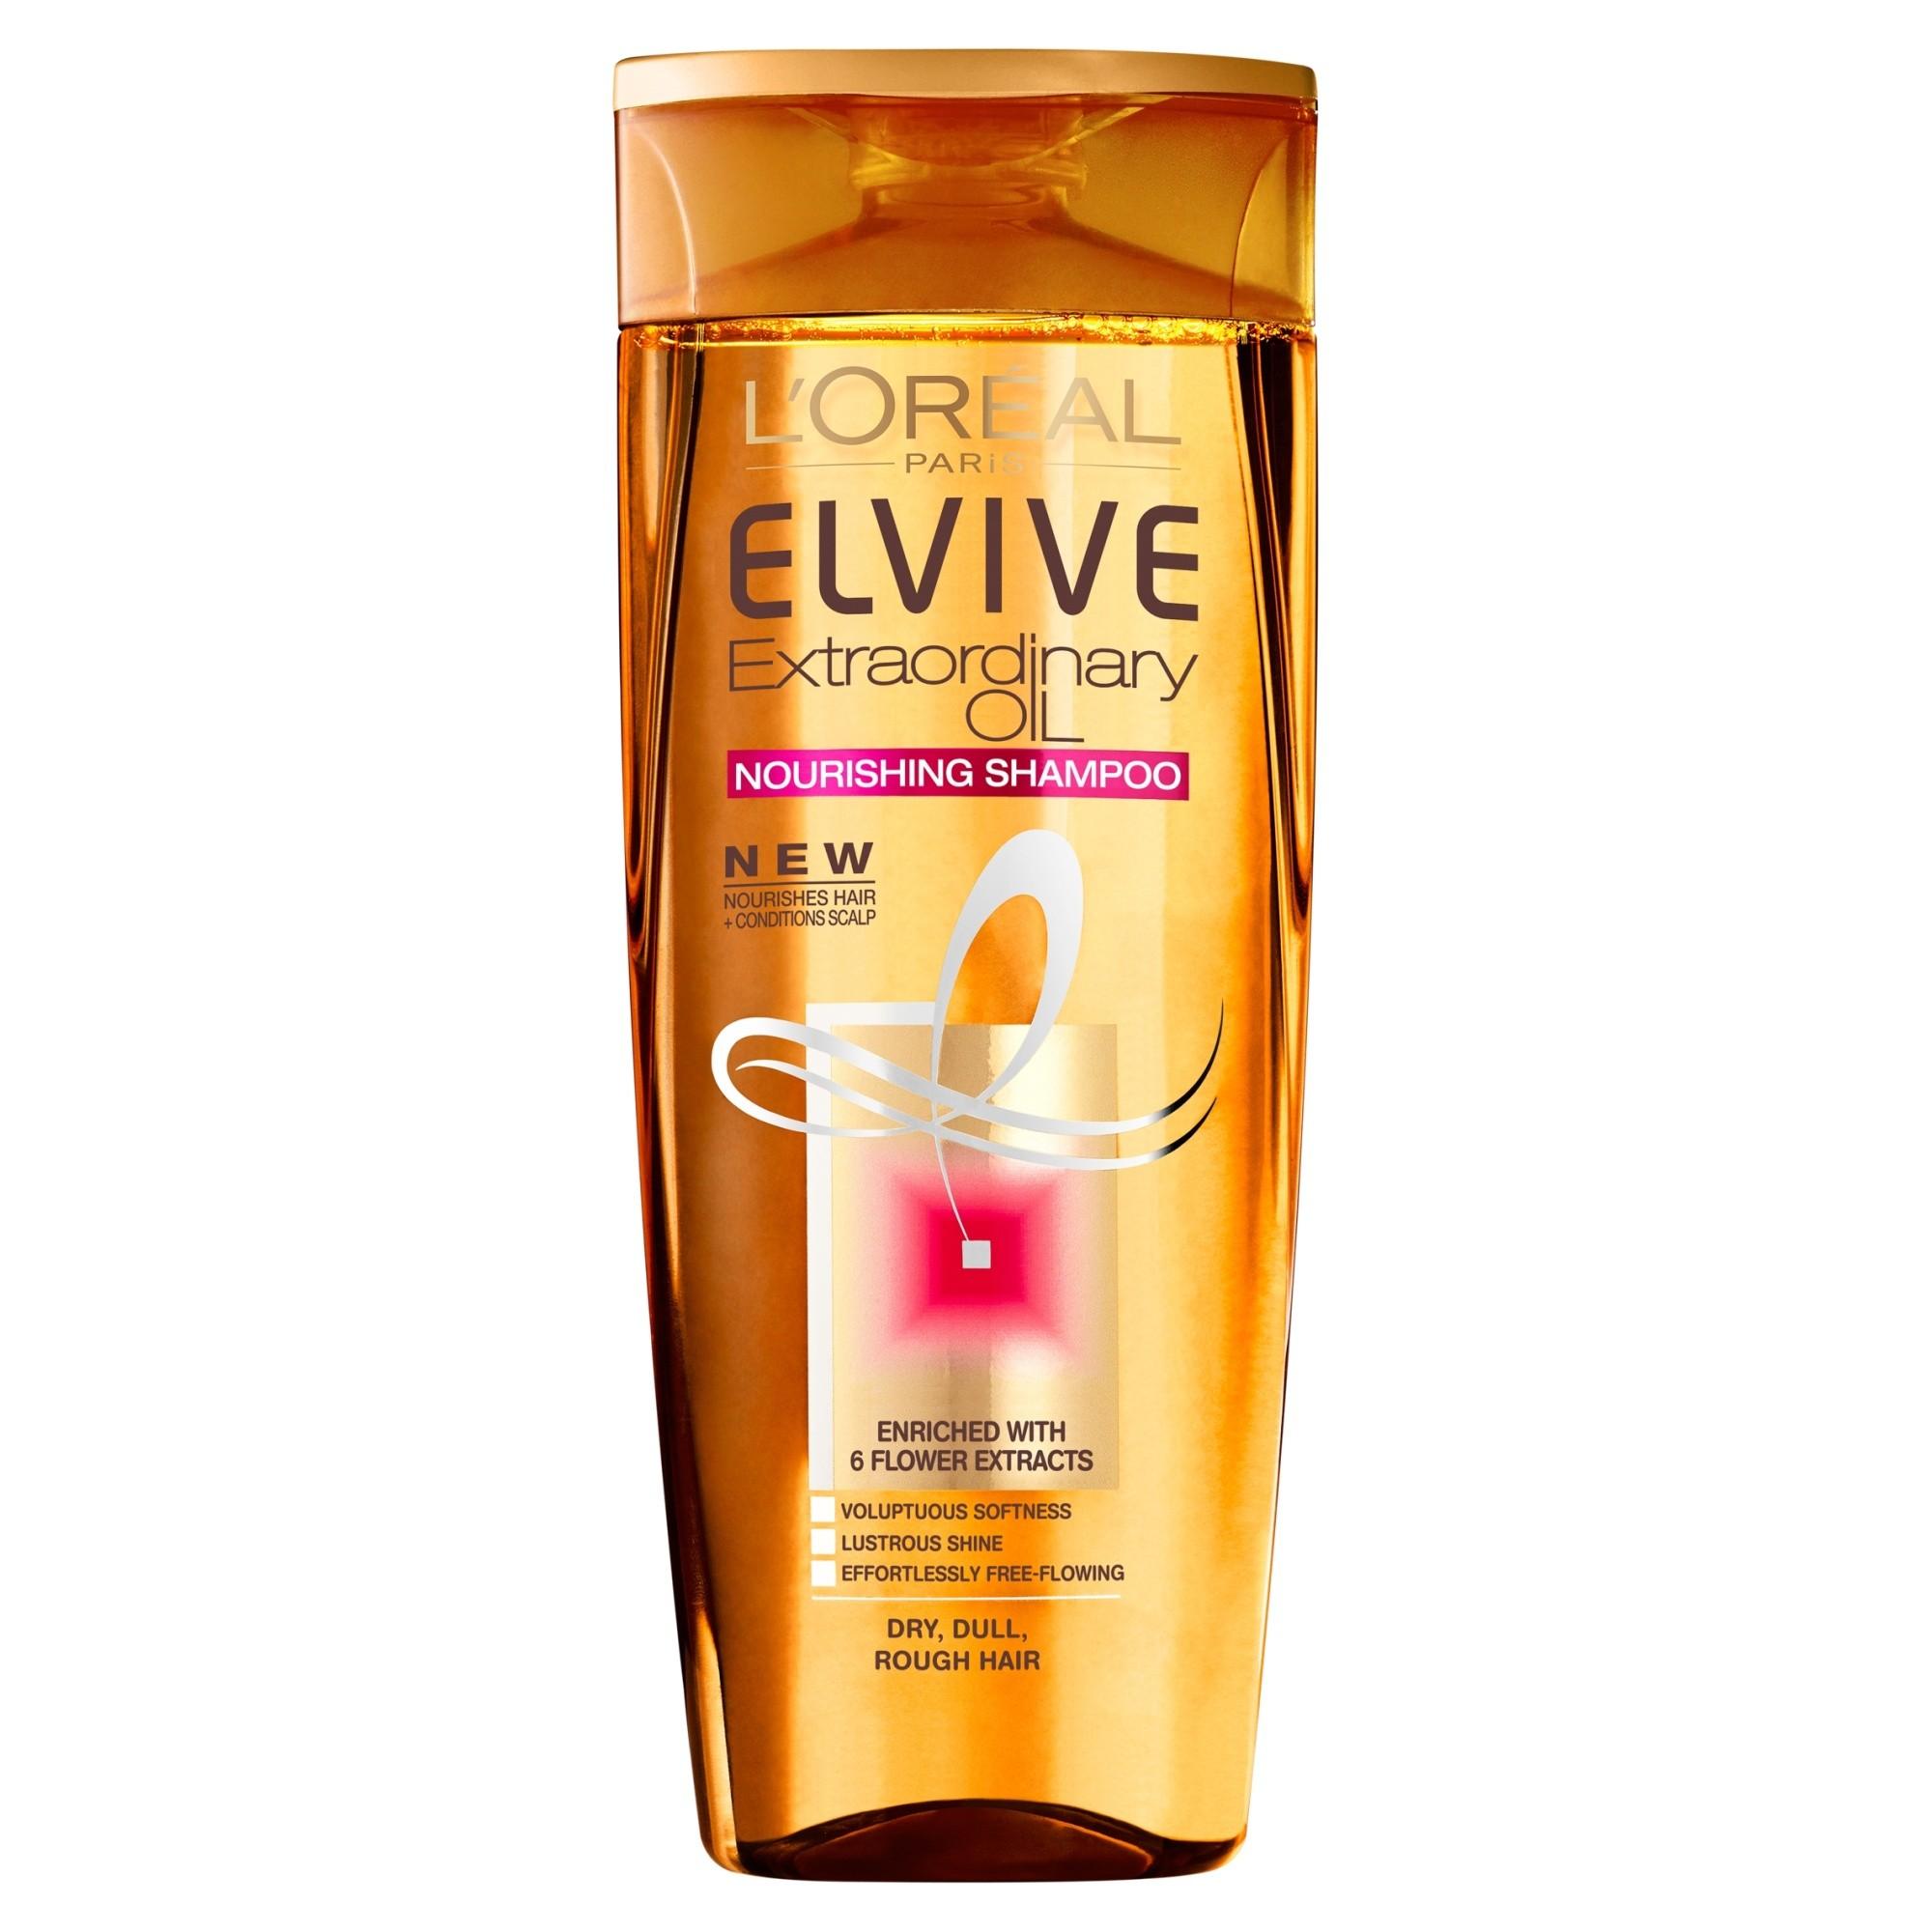 L'Oreal Paris Elvive Extraordinary Oil Shampoo for Dry Hair